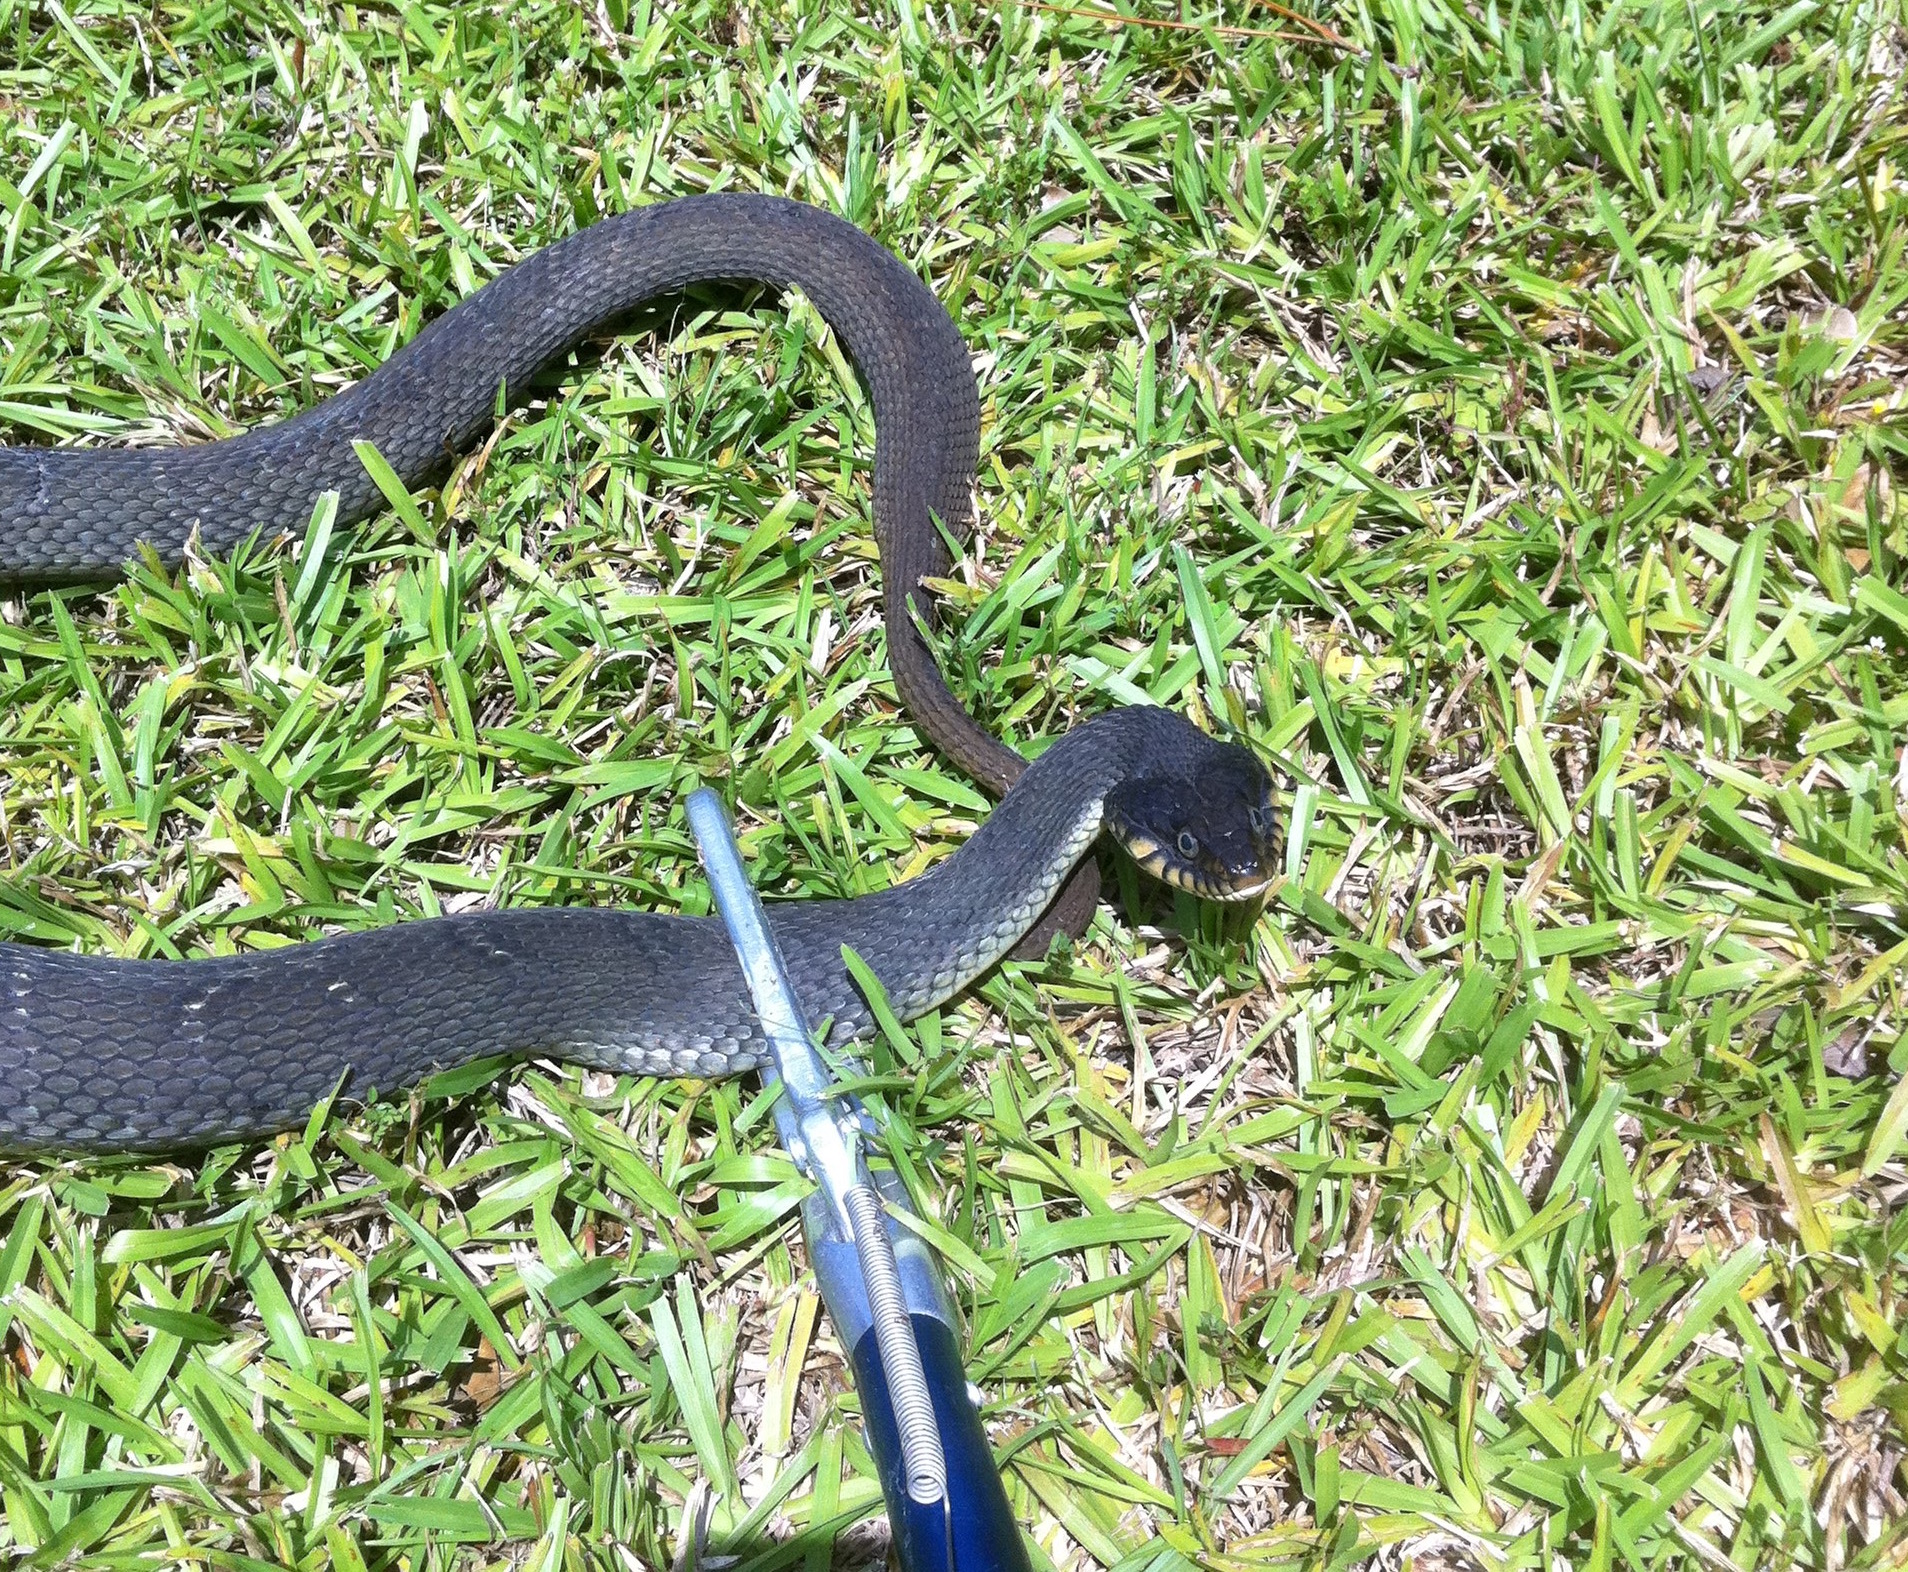 Snake Removal, Snakes, Snake Control, New Orleans Snake Removal